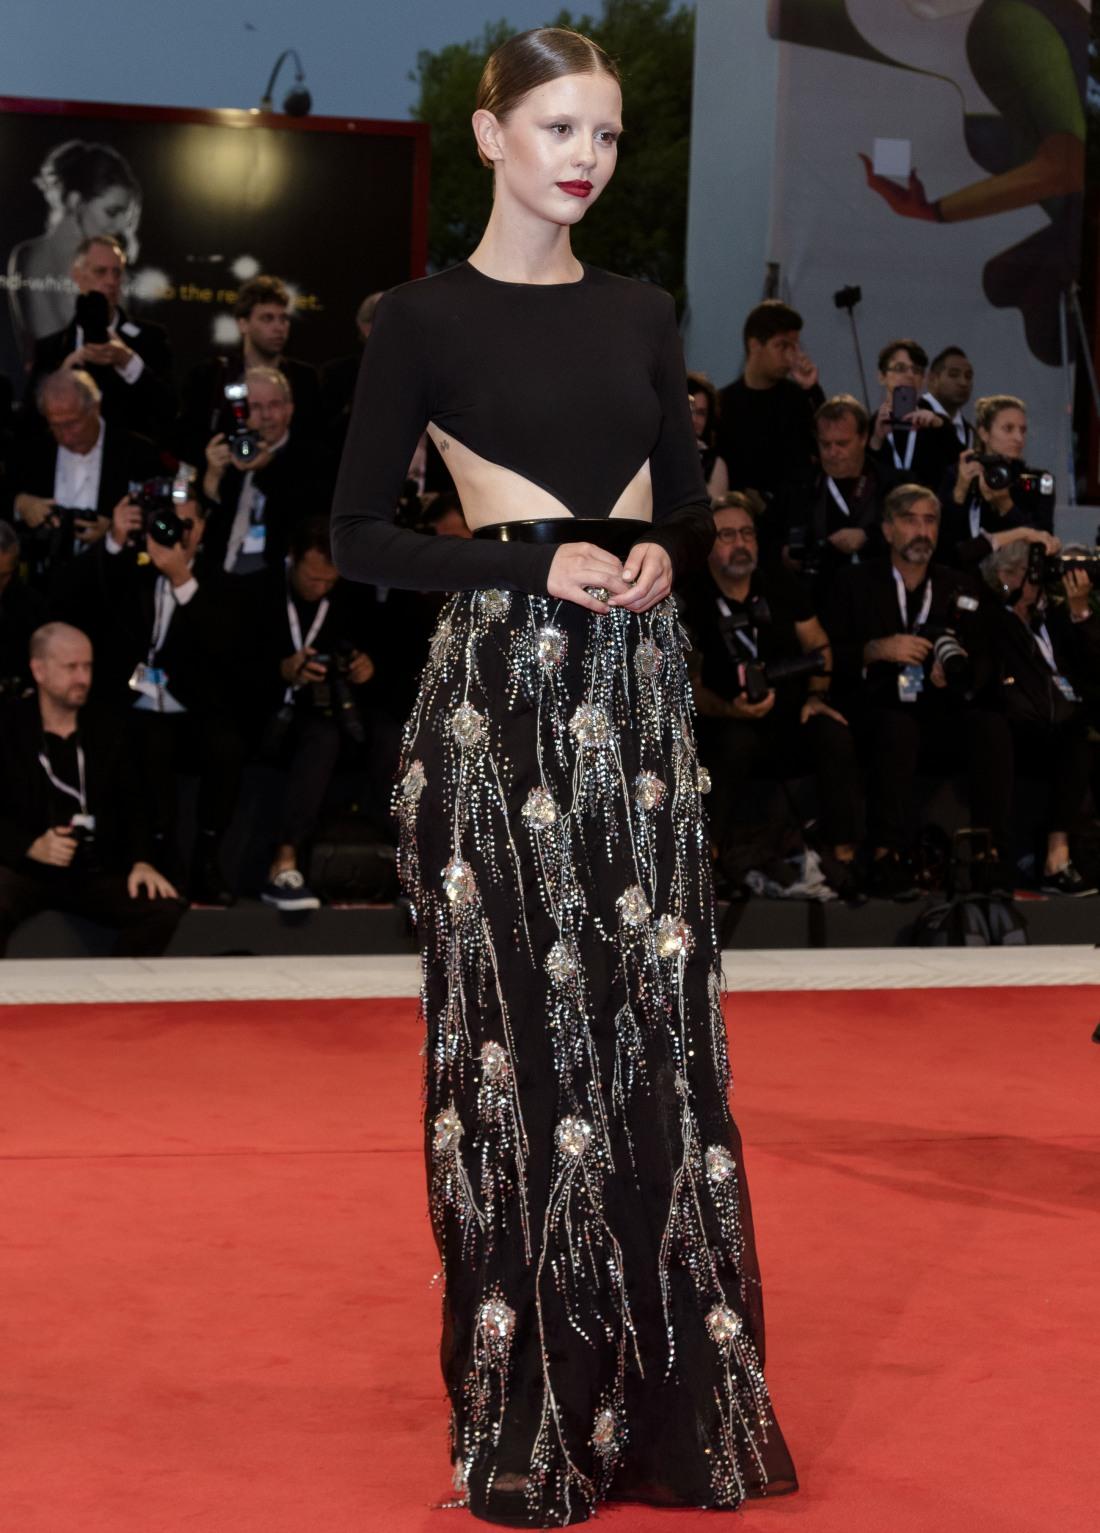 75th Venice International Film Festival - 'Suspiria' - Premiere